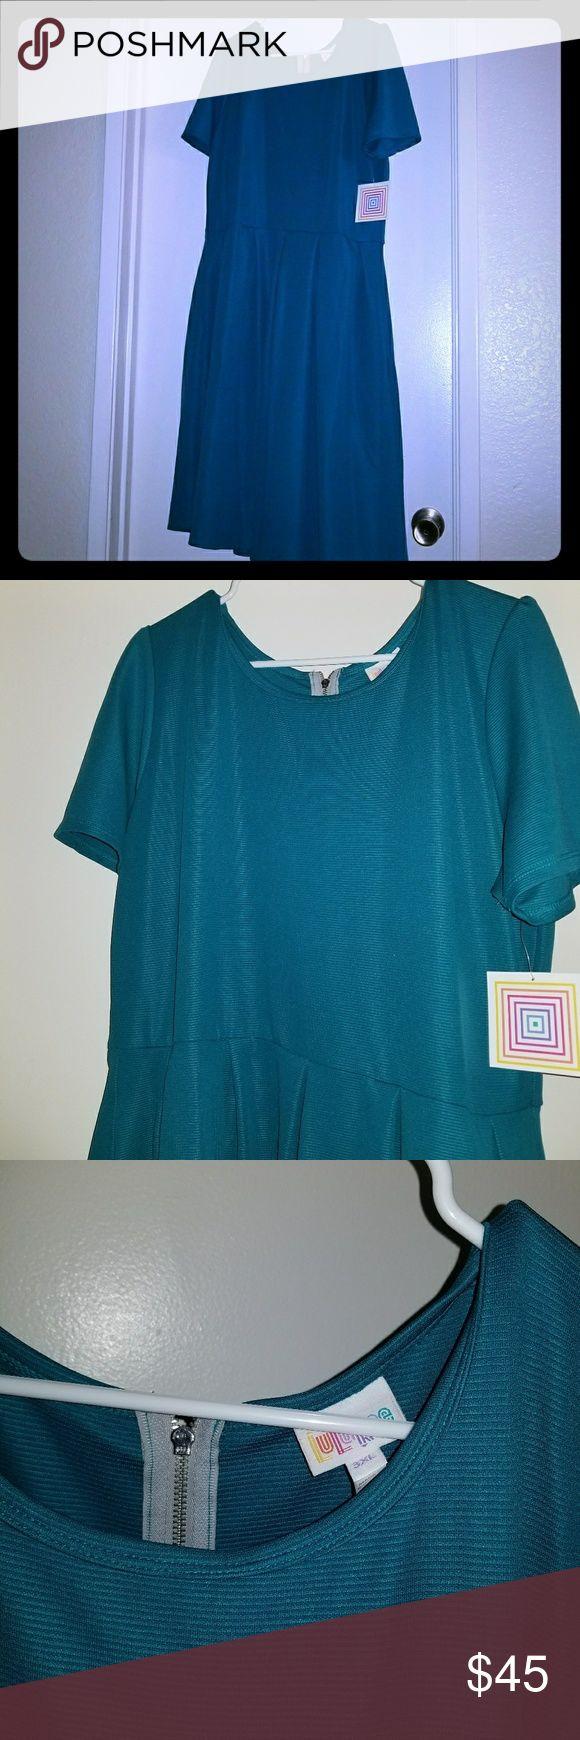 Lularoe Amelia New with tags, solid turquoise color. Pockets! LuLaRoe Dresses